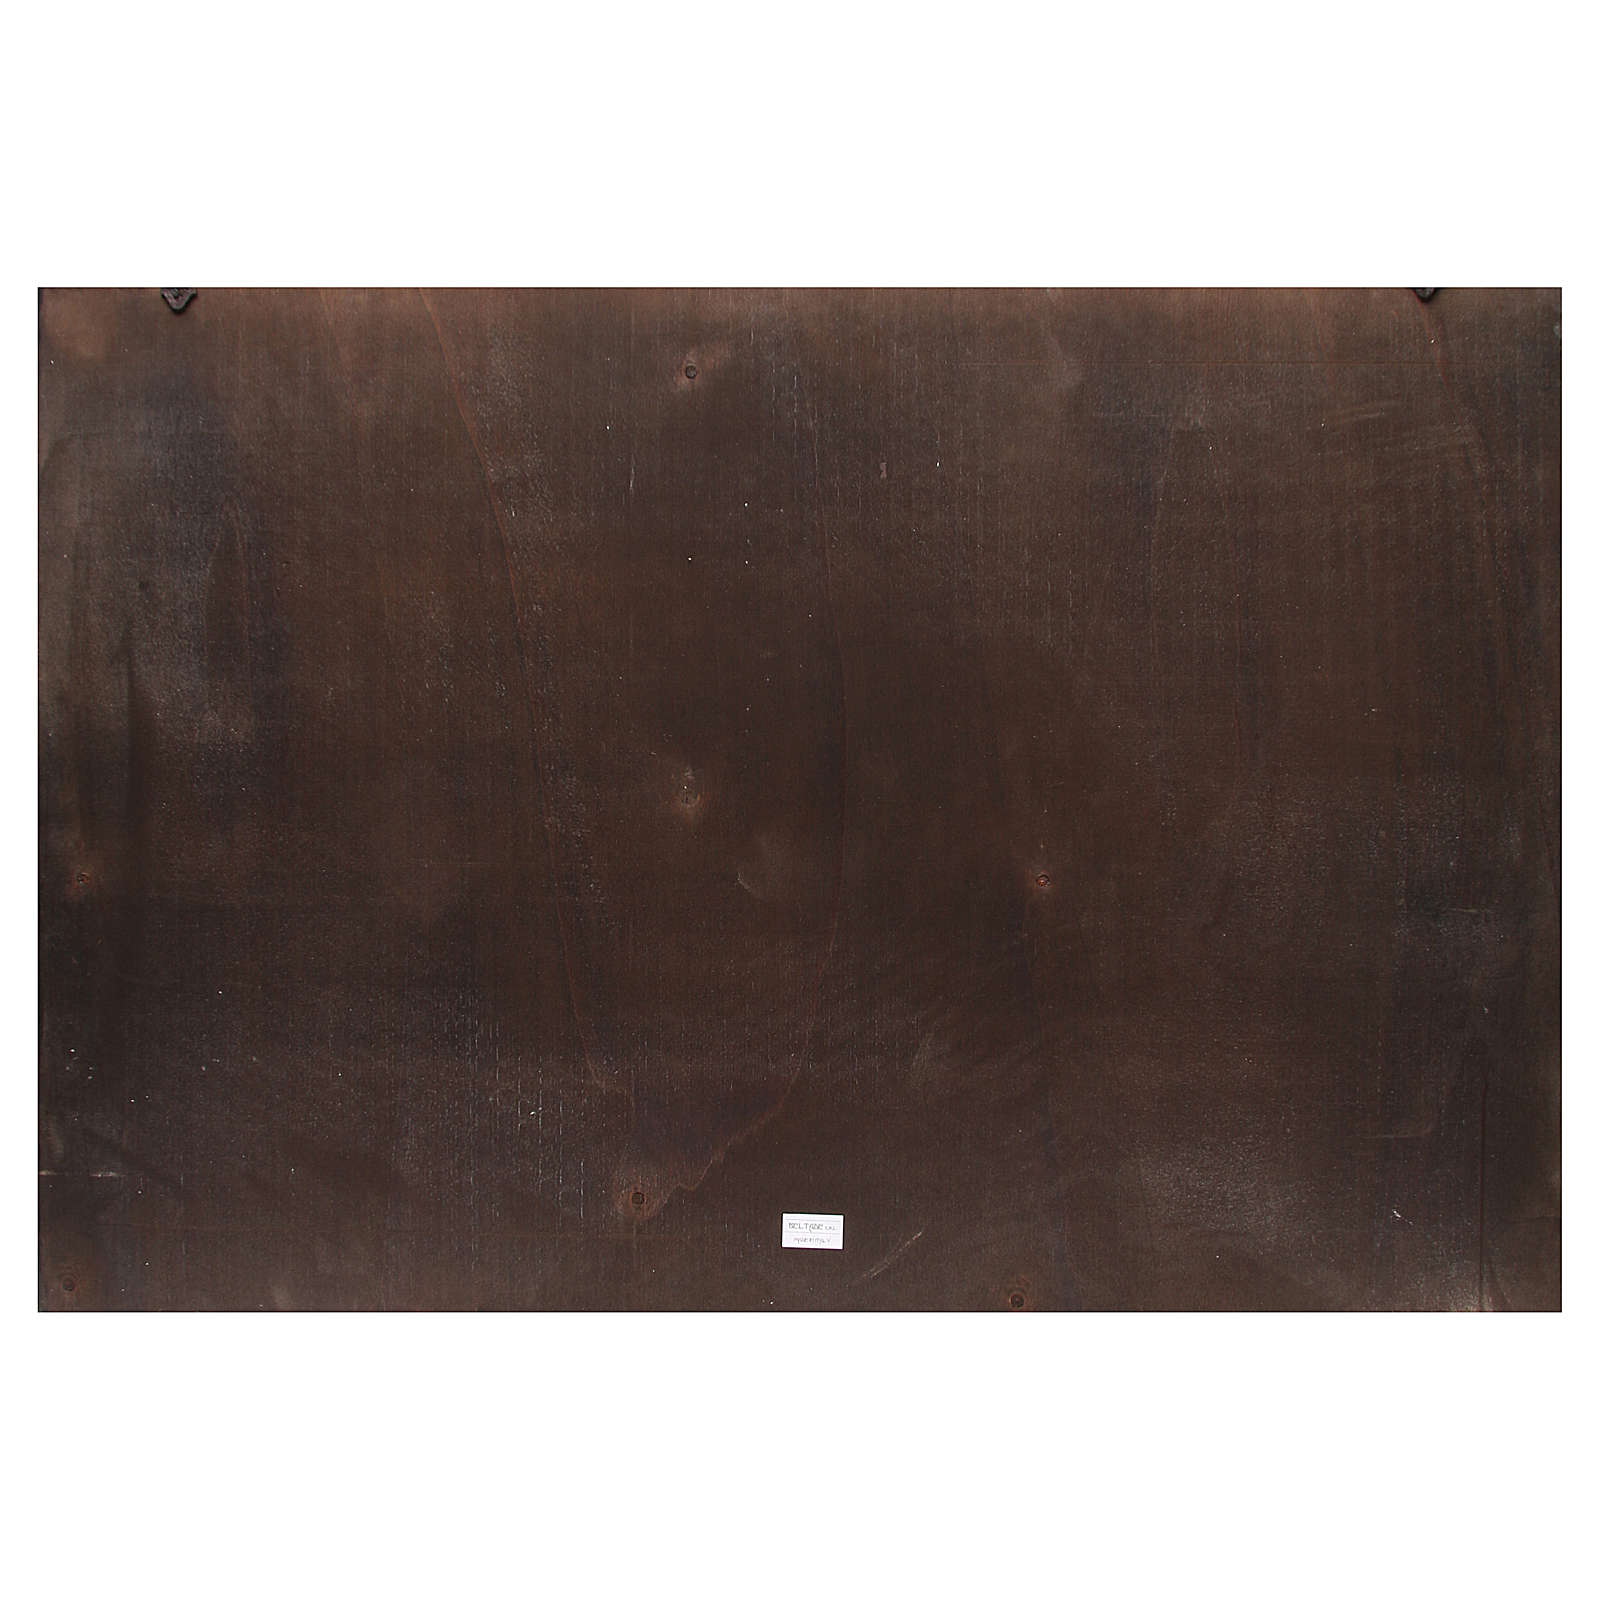 Fondo belén madera Ciudad árabe 100x68cm 4